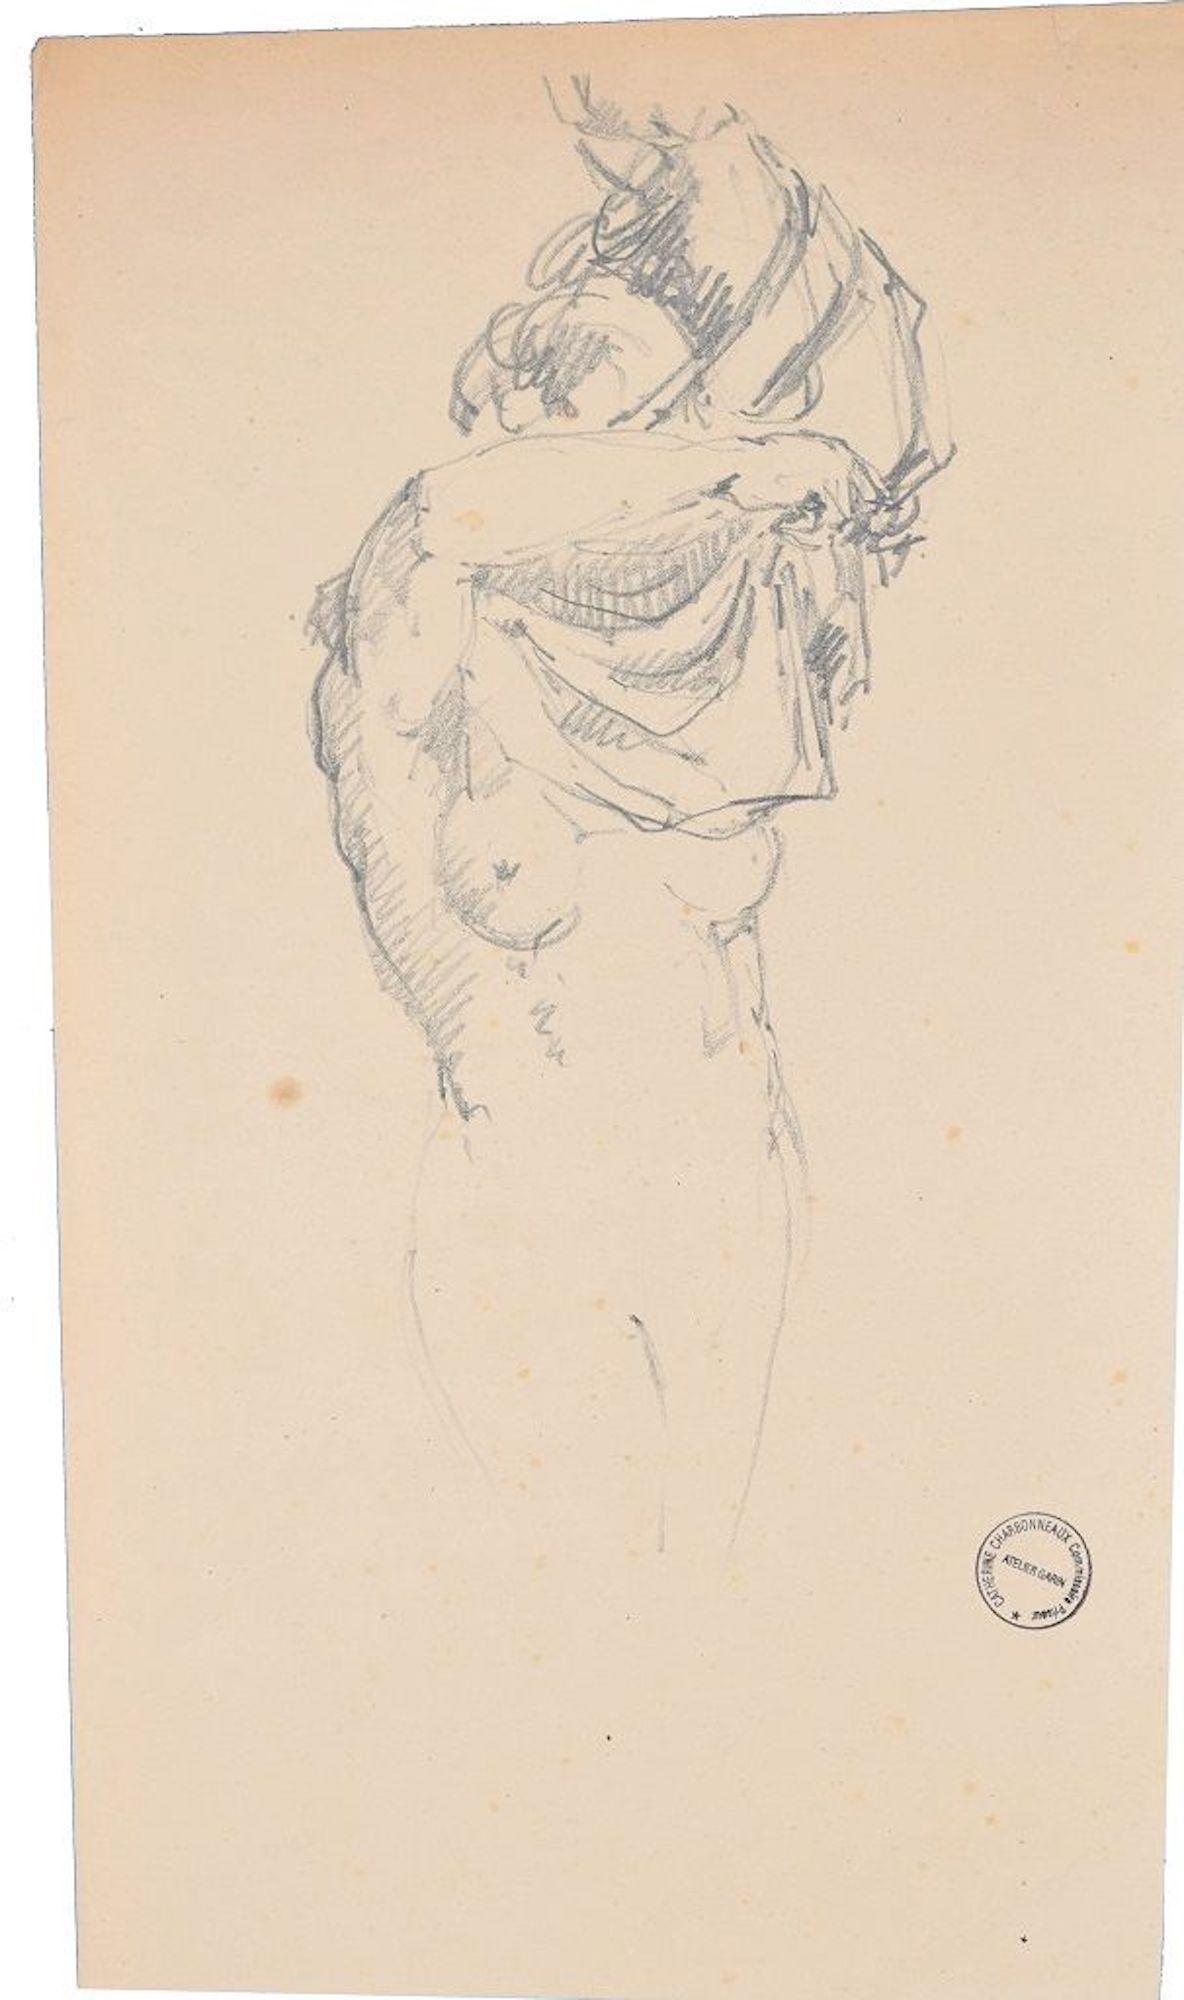 Drawing Undress Man In Art